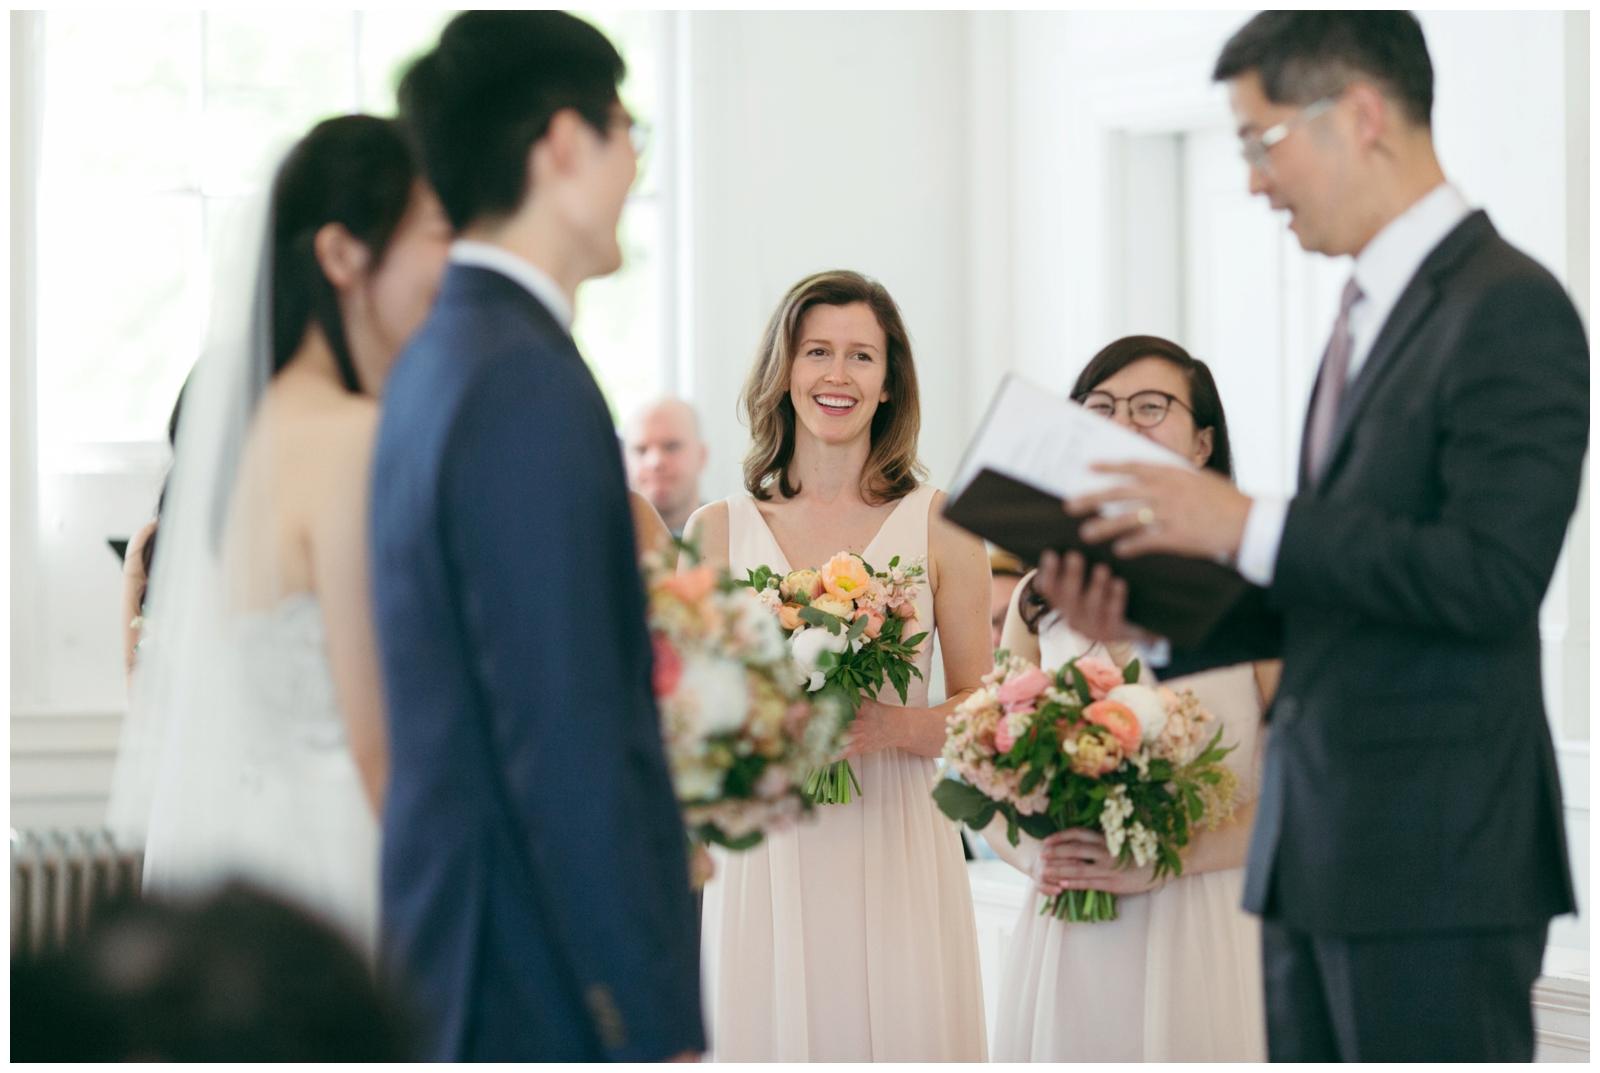 Samberg-Conference-Center-Boston-Wedding-Photographer-Bailey-Q-Photo-056.jpg